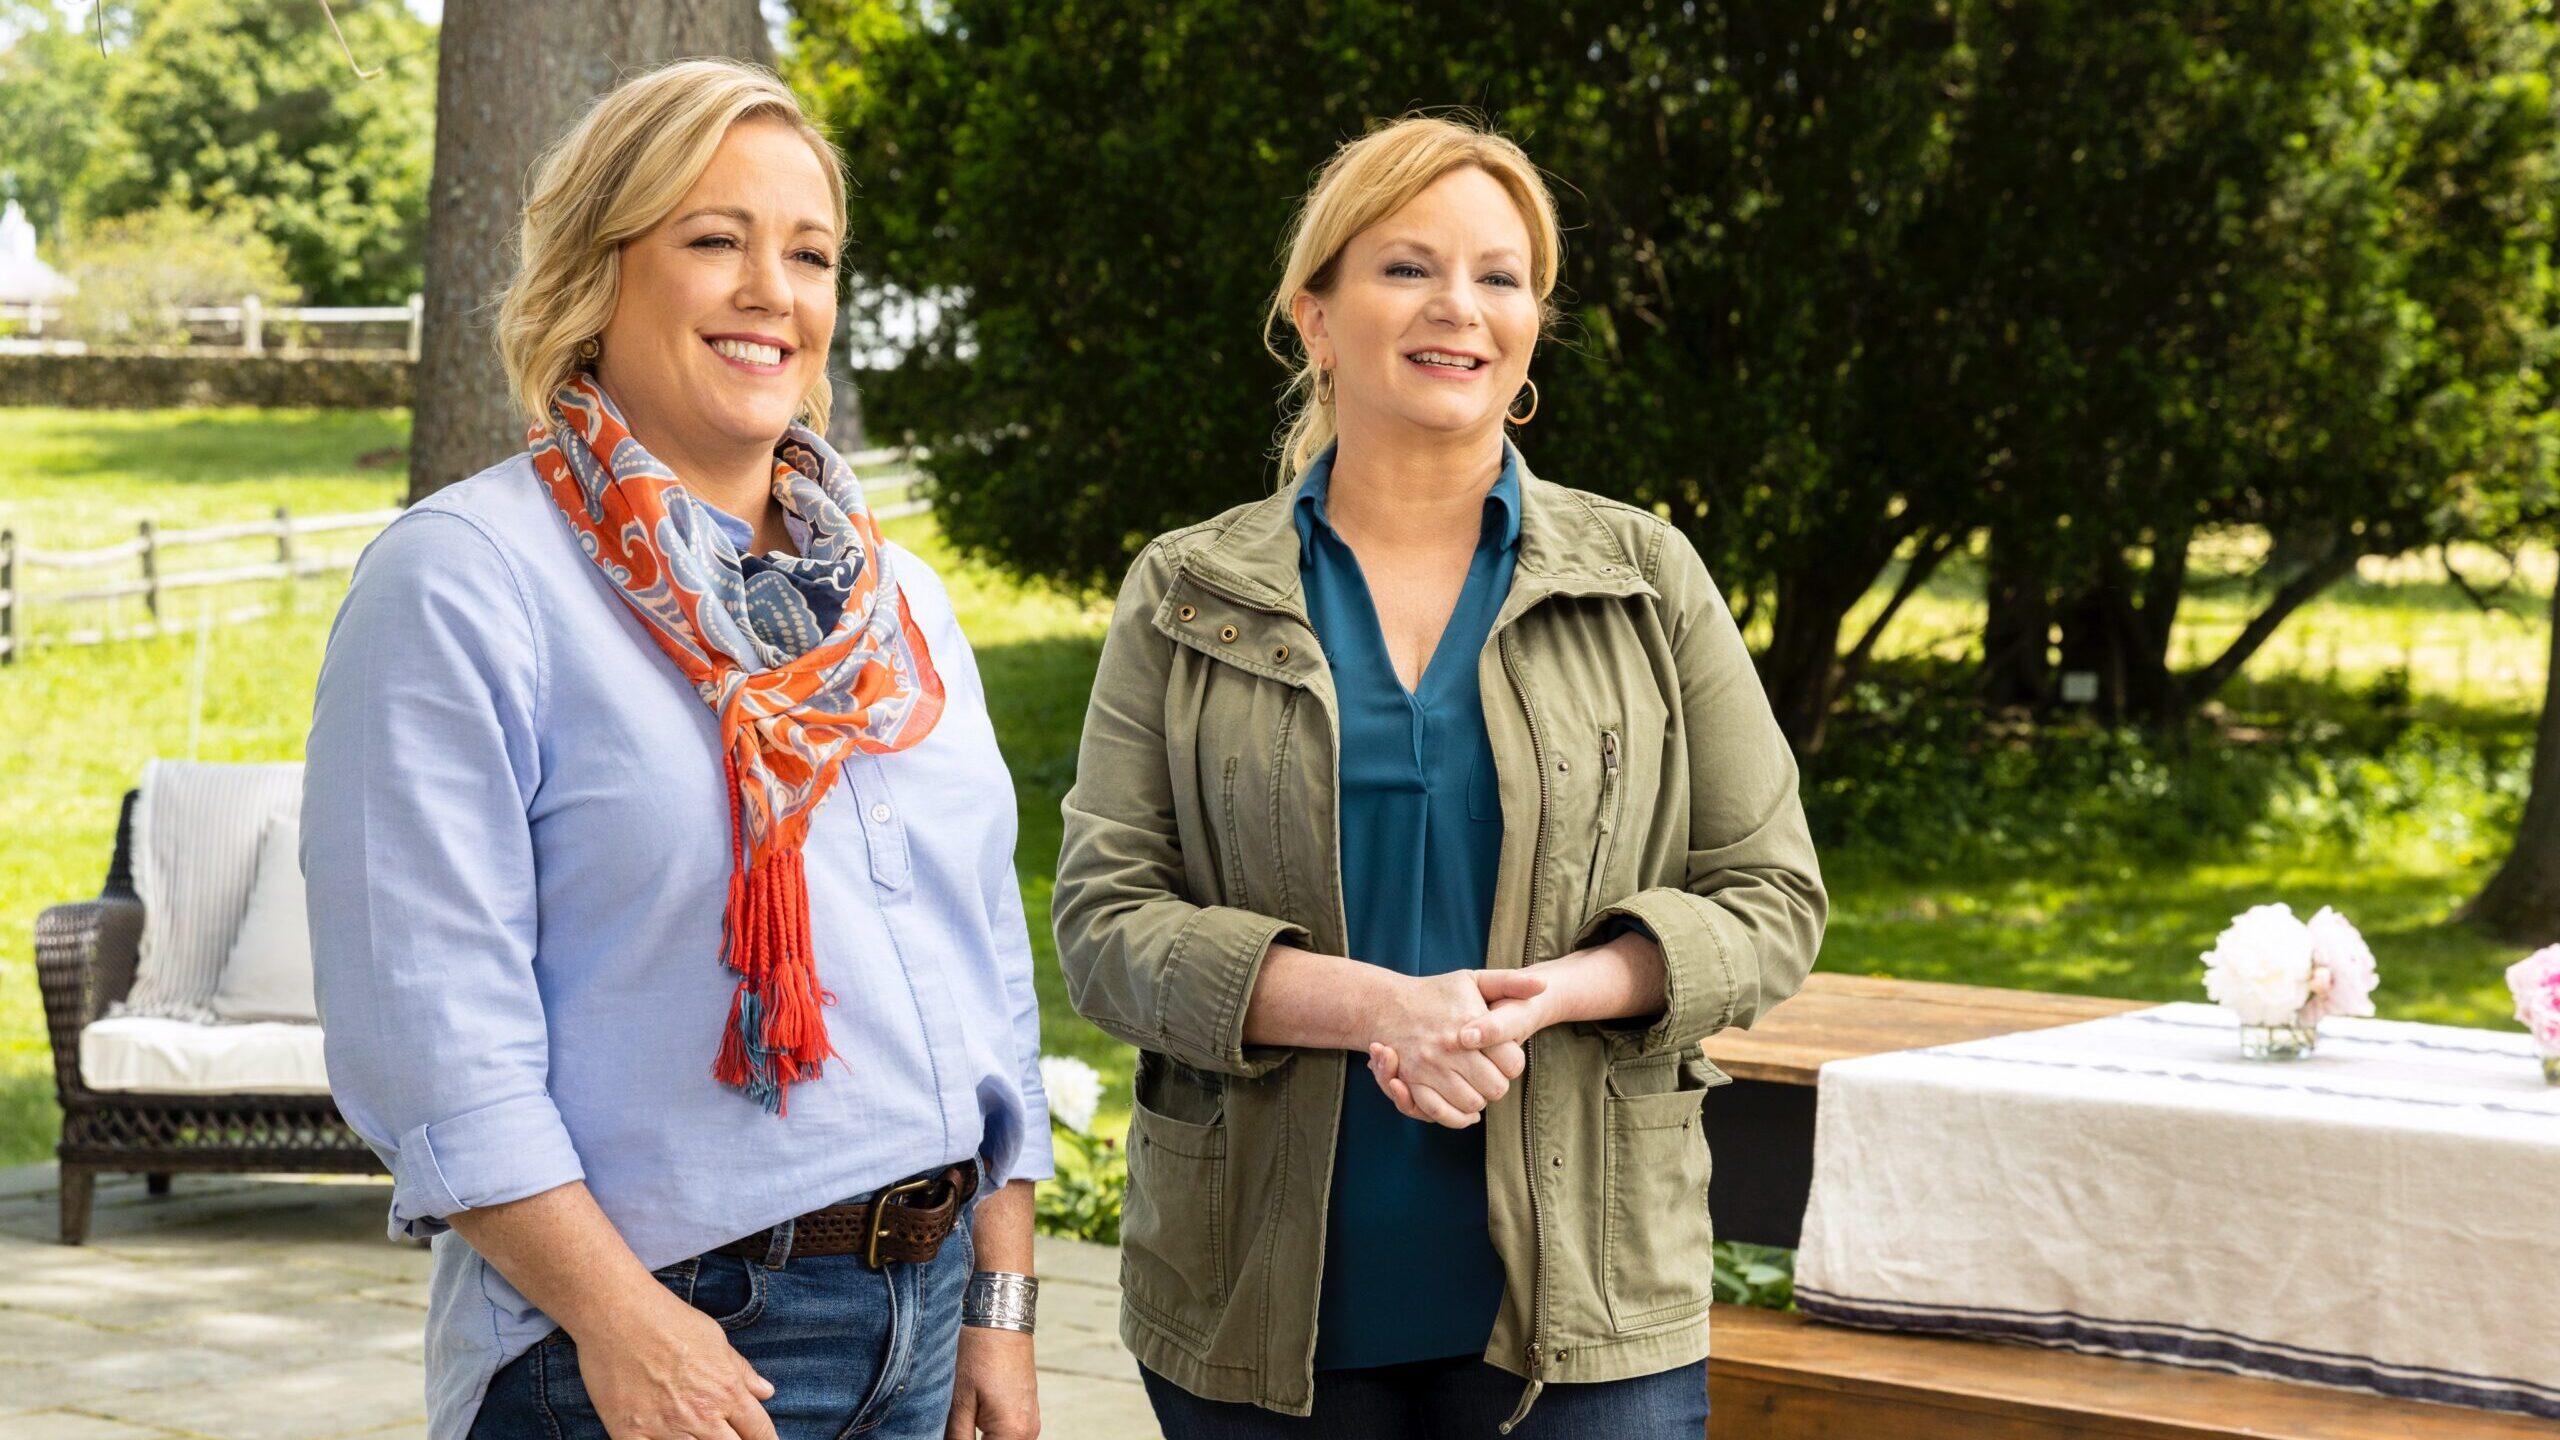 Cook's Country hosts Bridget Lancaster and Julia Collin Davison standing outdoors